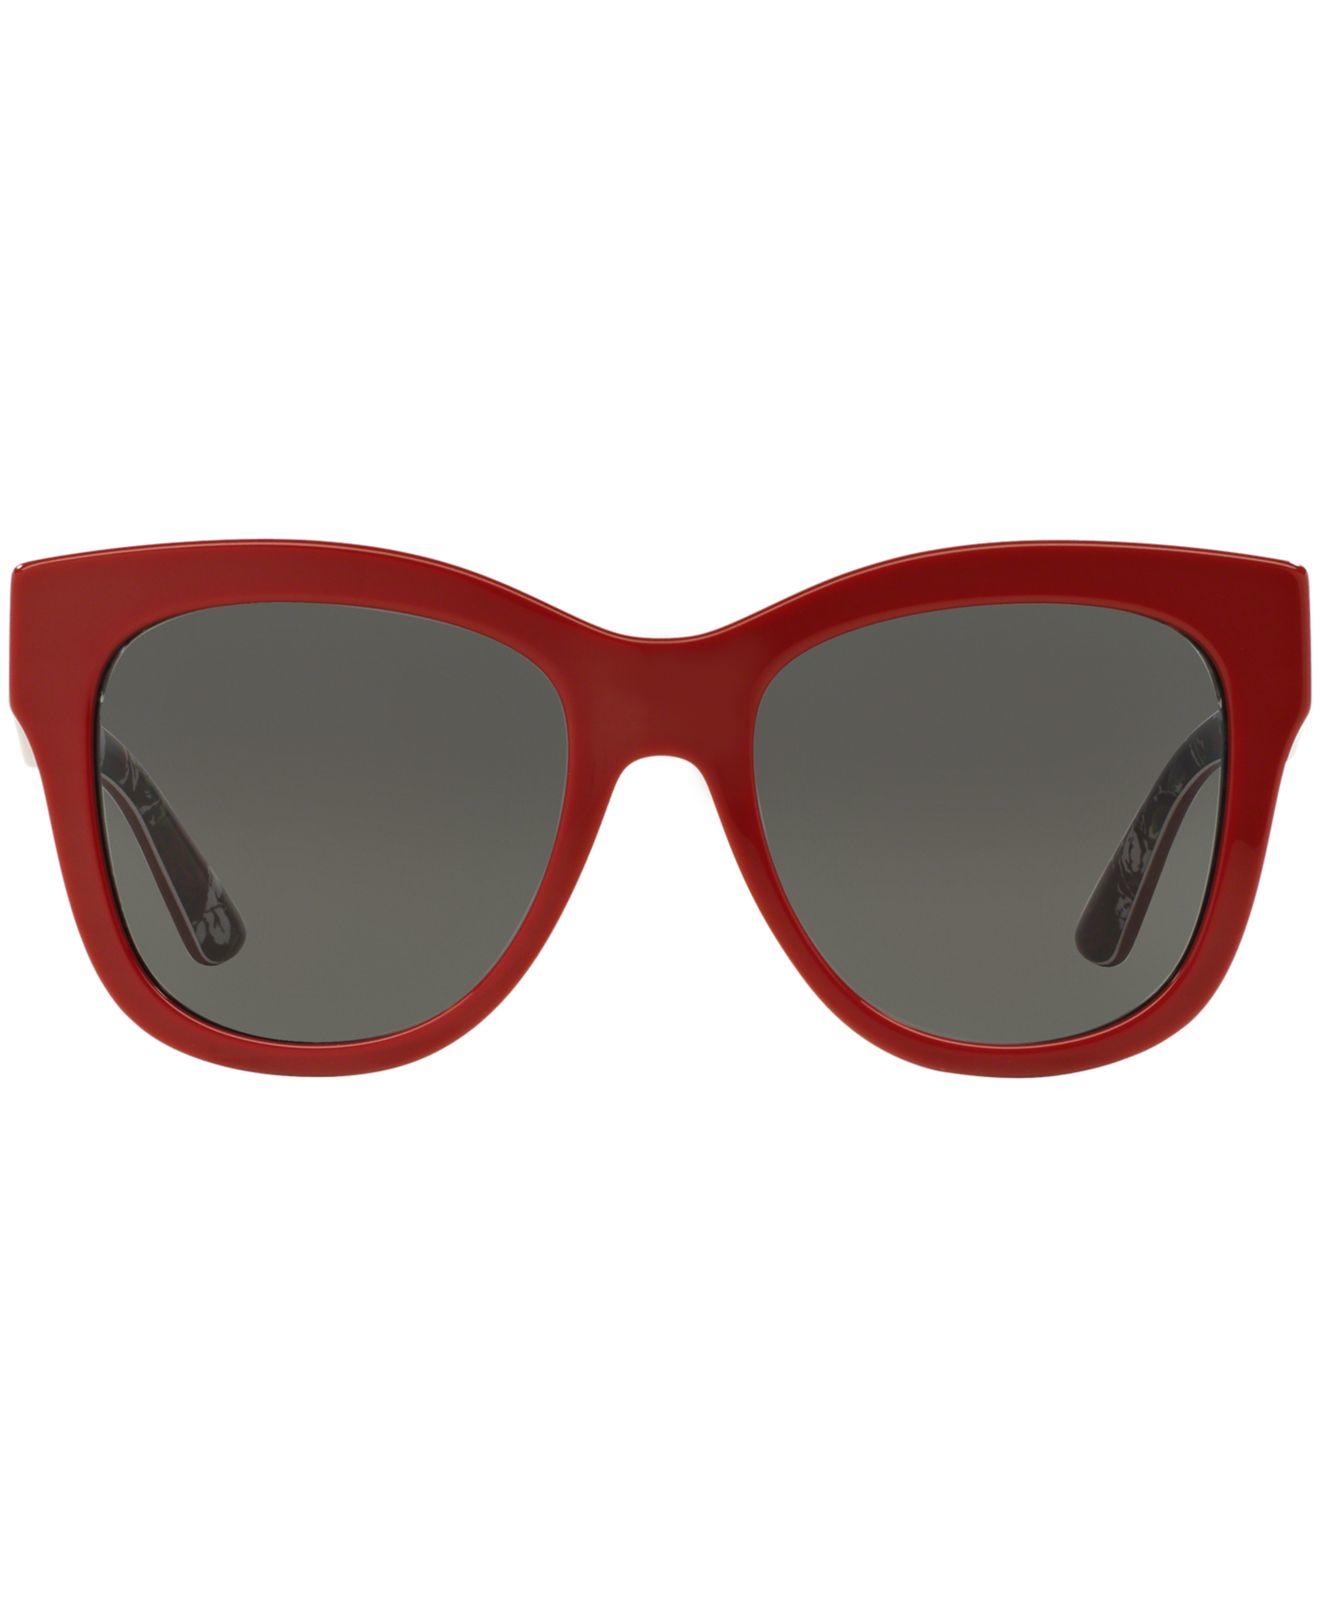 Gabbana Dolceamp; 55 And Dg4270 Red cALq34R5j